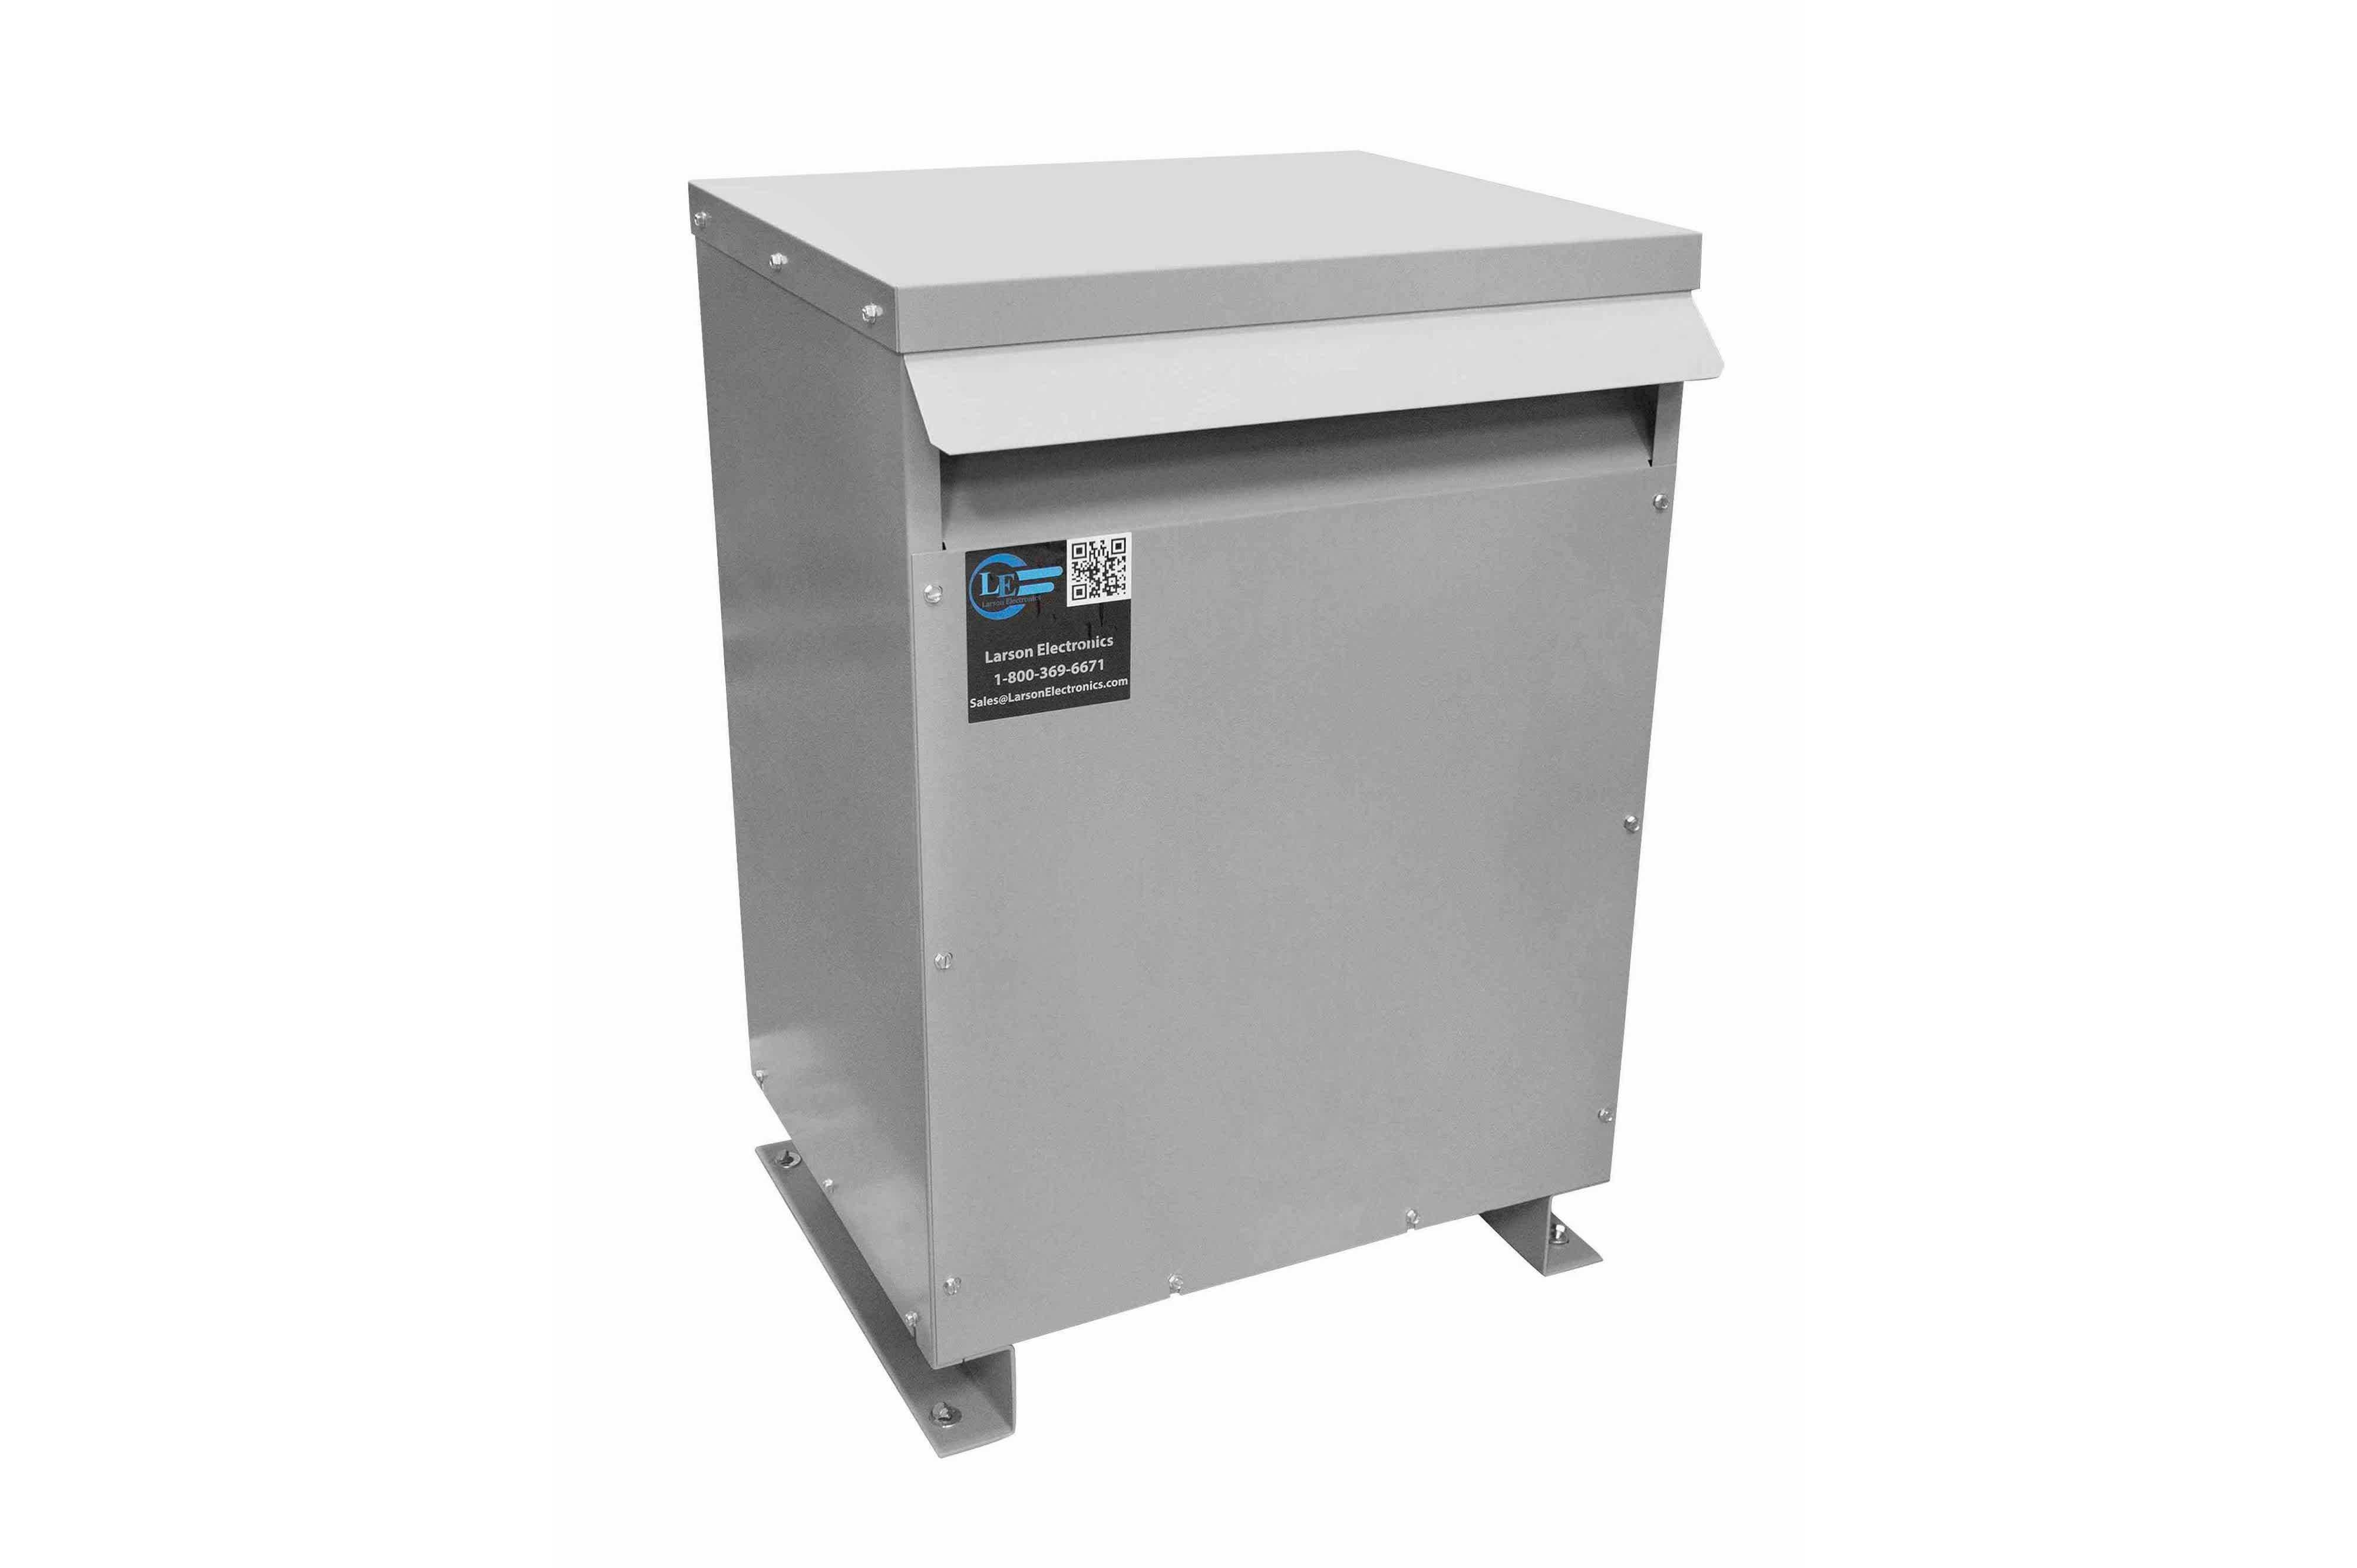 40 kVA 3PH Isolation Transformer, 575V Wye Primary, 400Y/231 Wye-N Secondary, N3R, Ventilated, 60 Hz